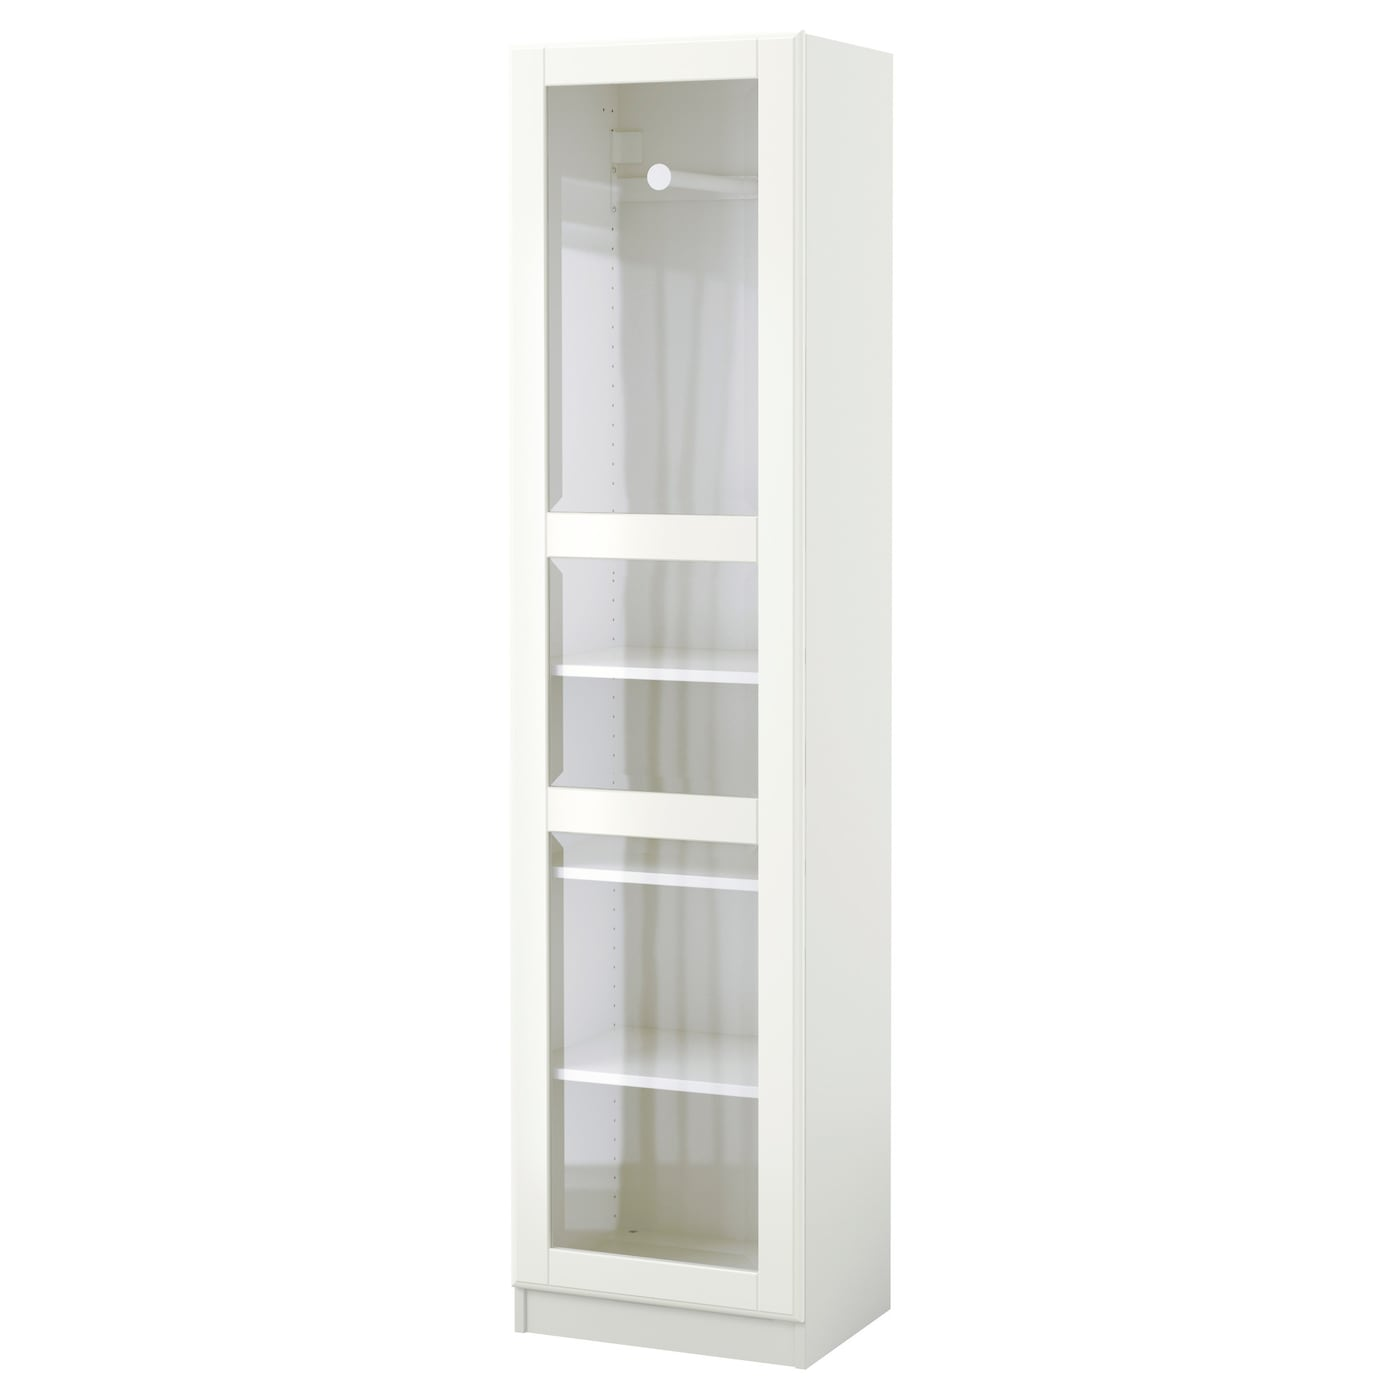 pax wardrobe white tyssedal glass 50 x 38 x 201 cm ikea. Black Bedroom Furniture Sets. Home Design Ideas